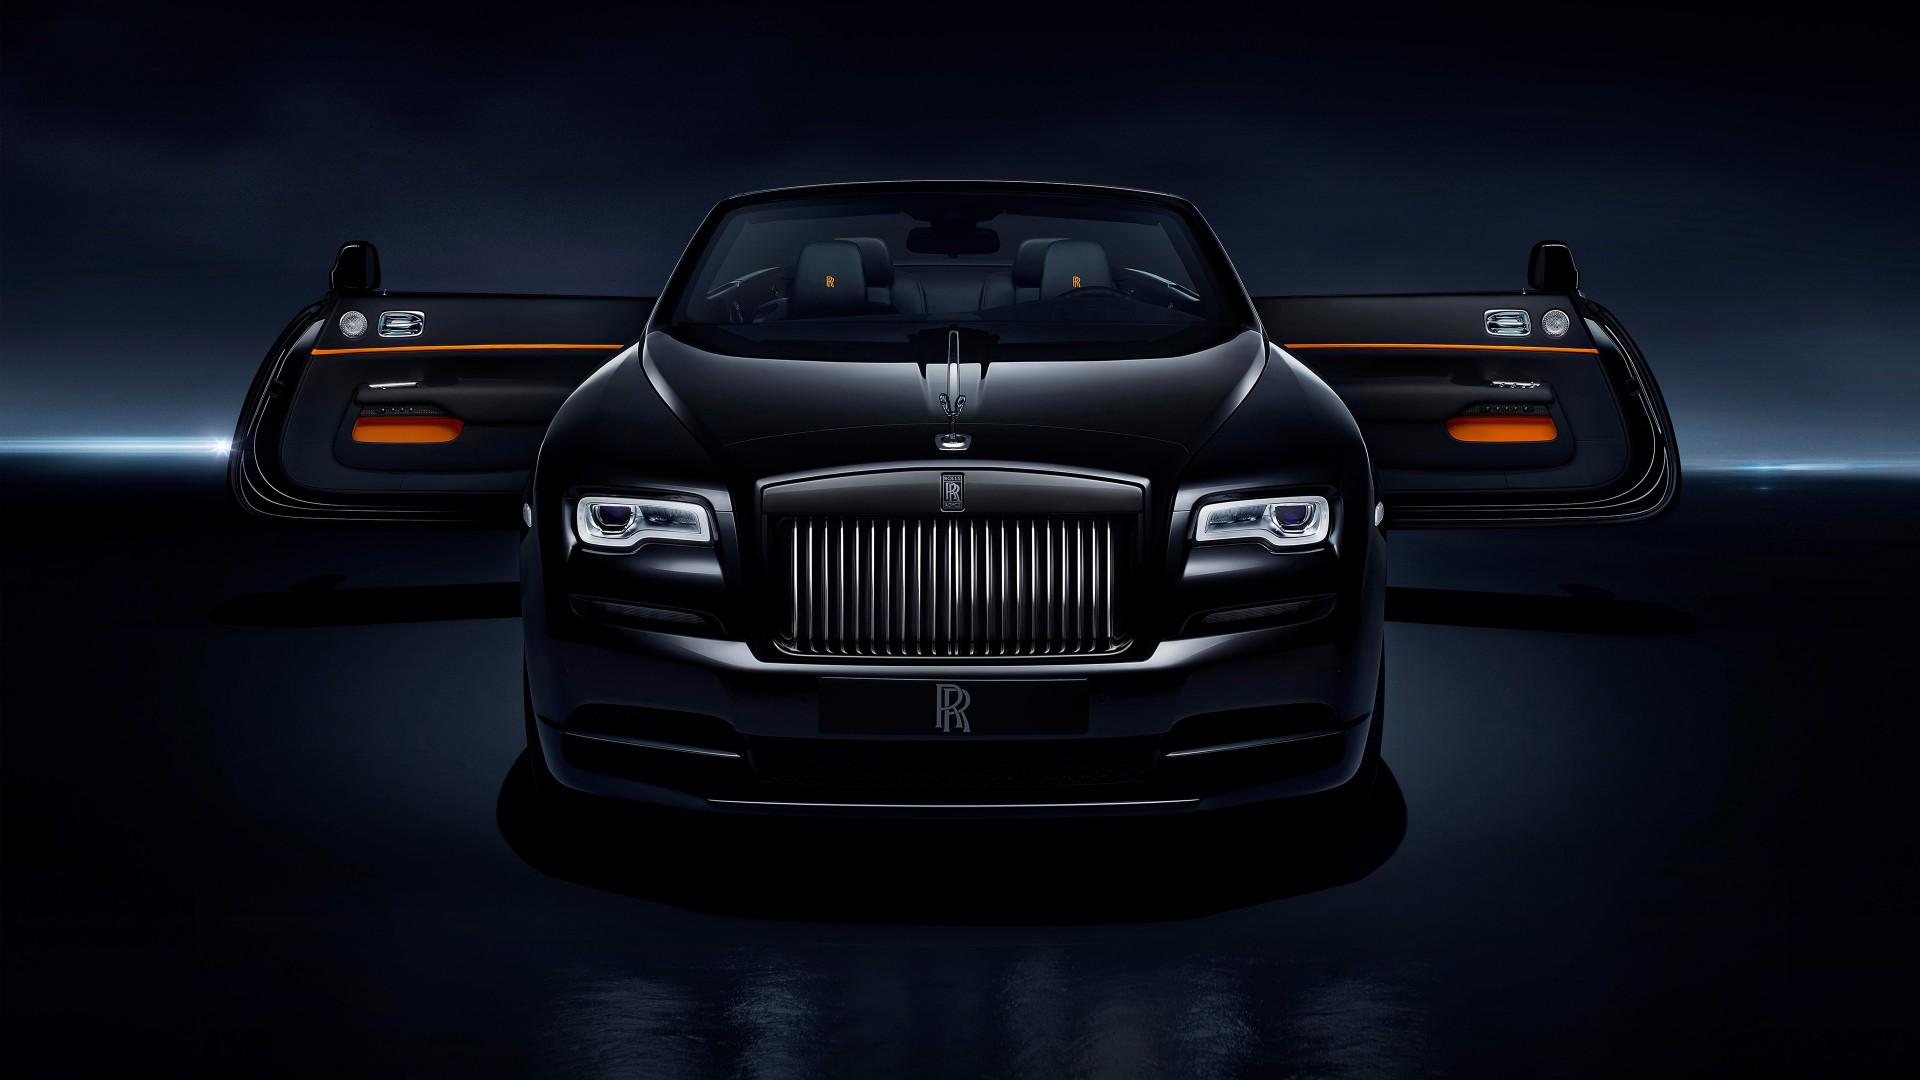 Pure Black Wallpaper Rolls Royce Dawn Black Badge 2017 4k Wallpapers Hd